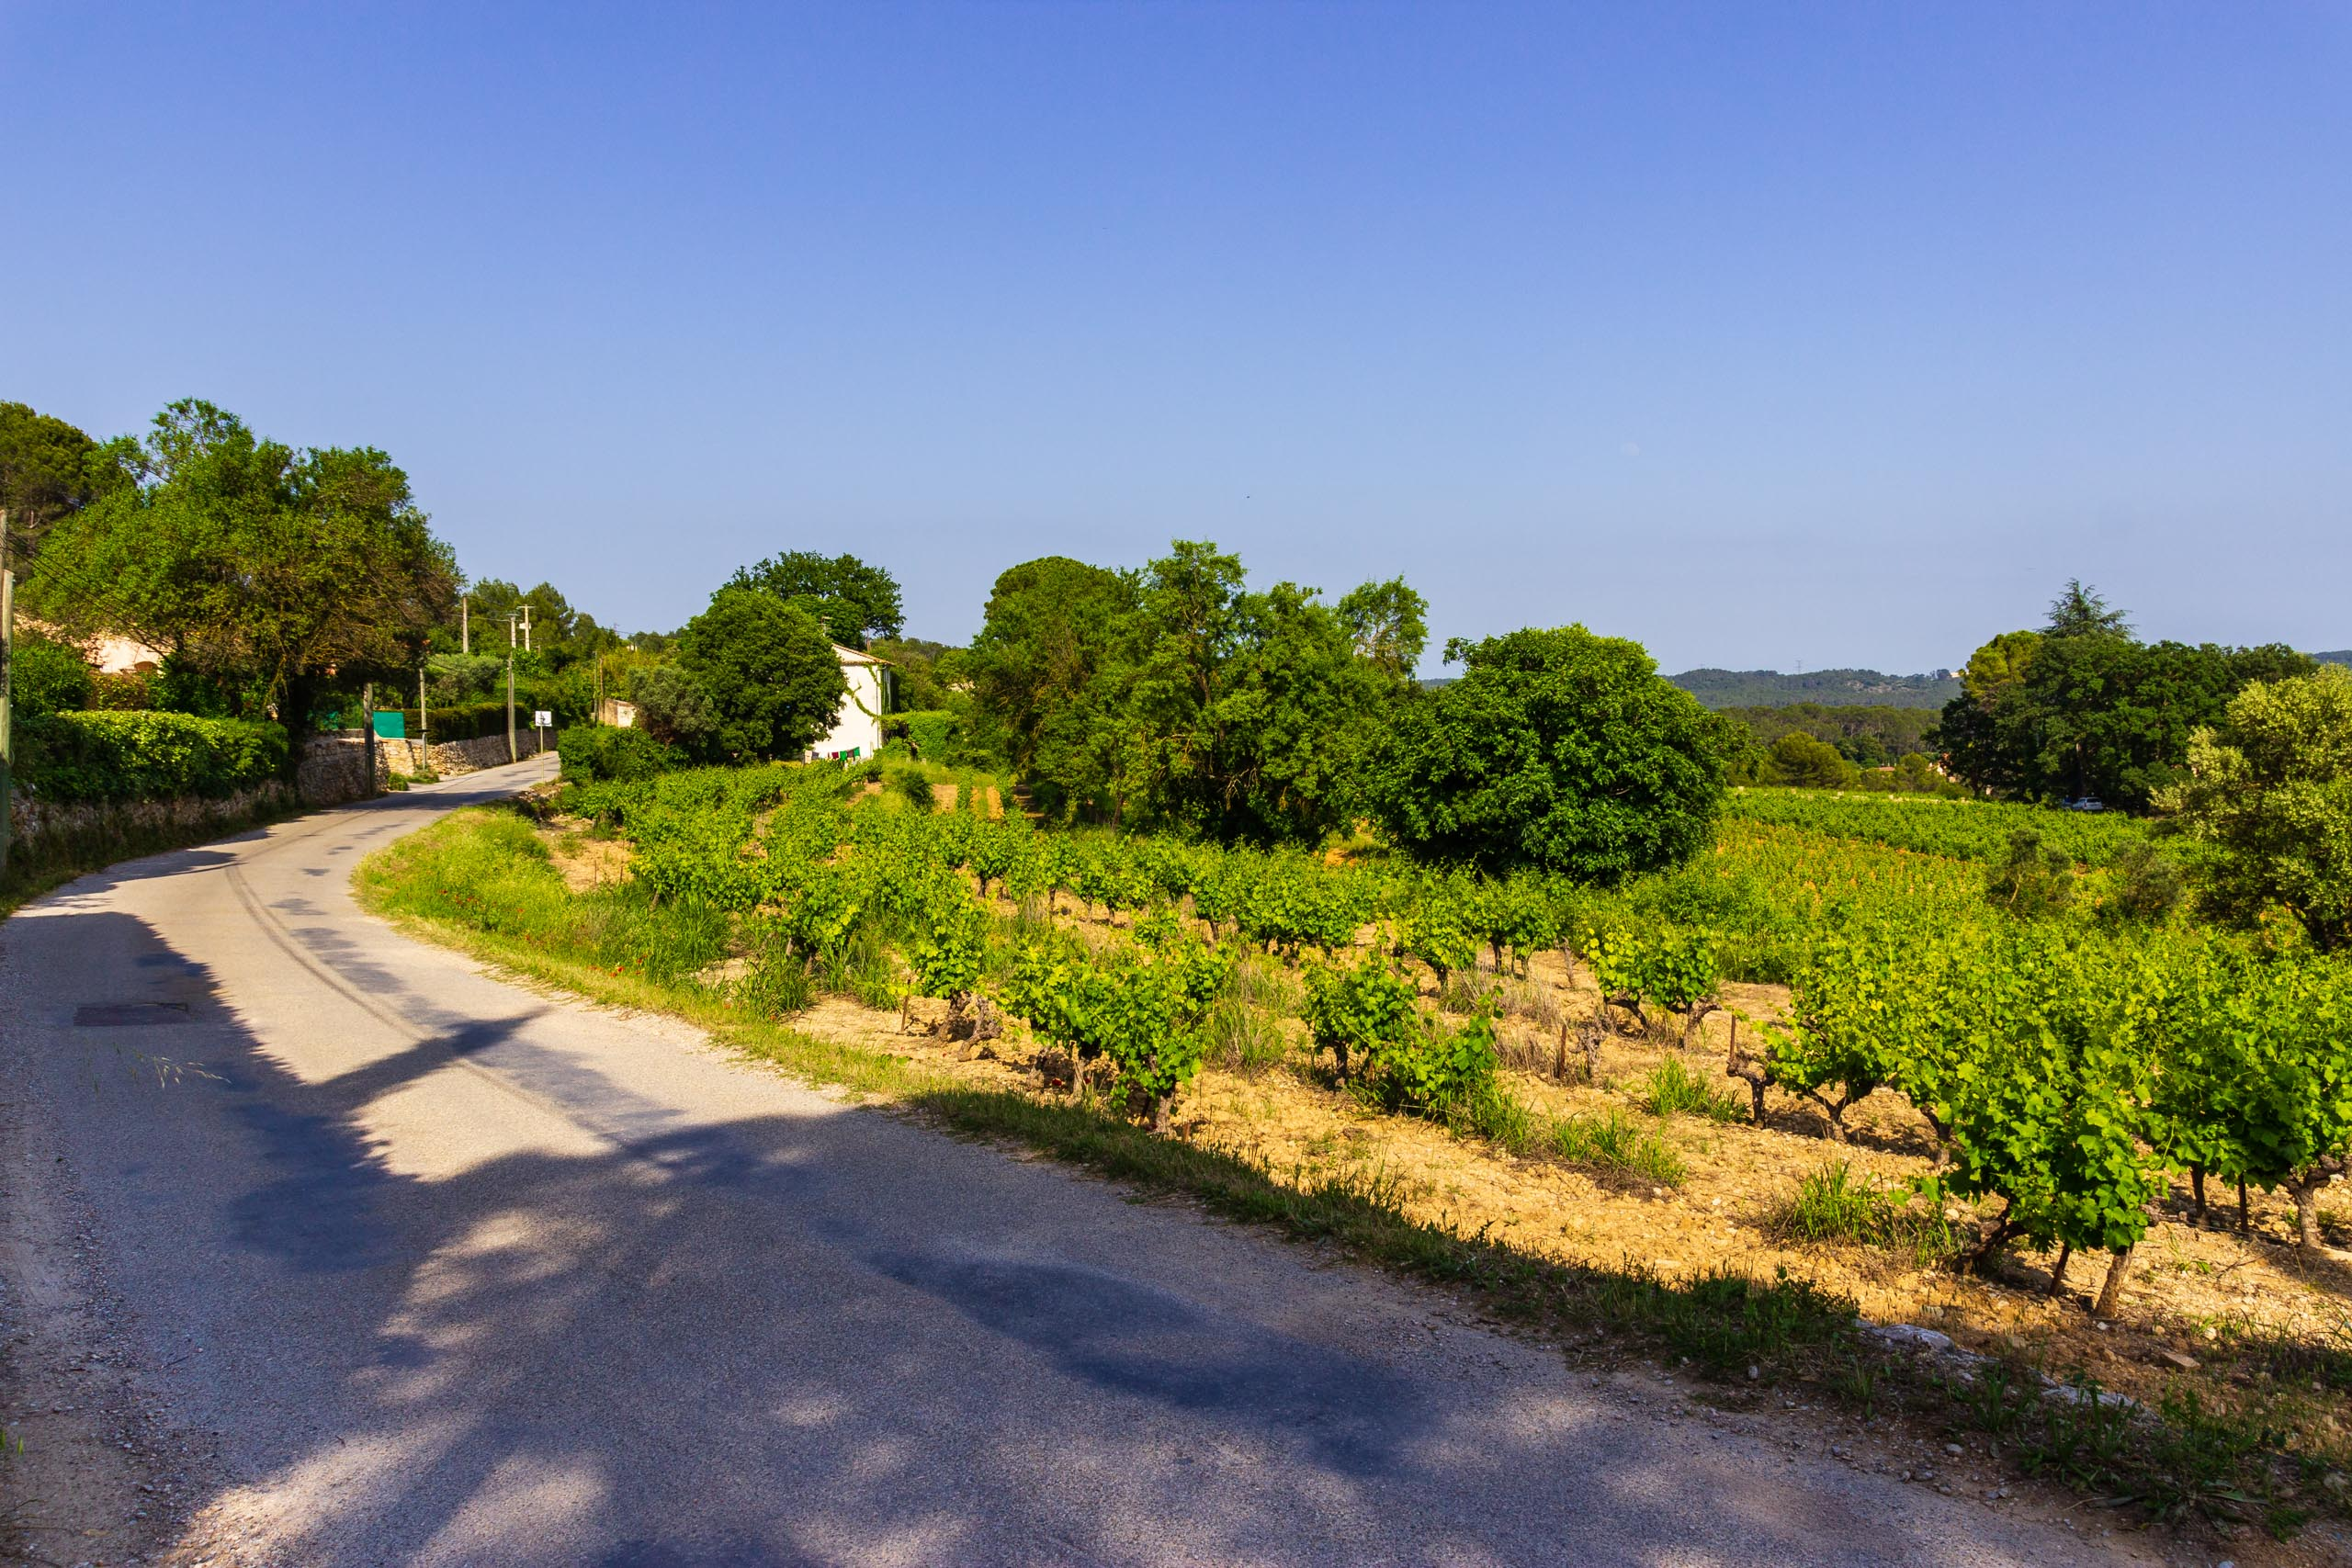 2018 05 Provence LaCouaste 001